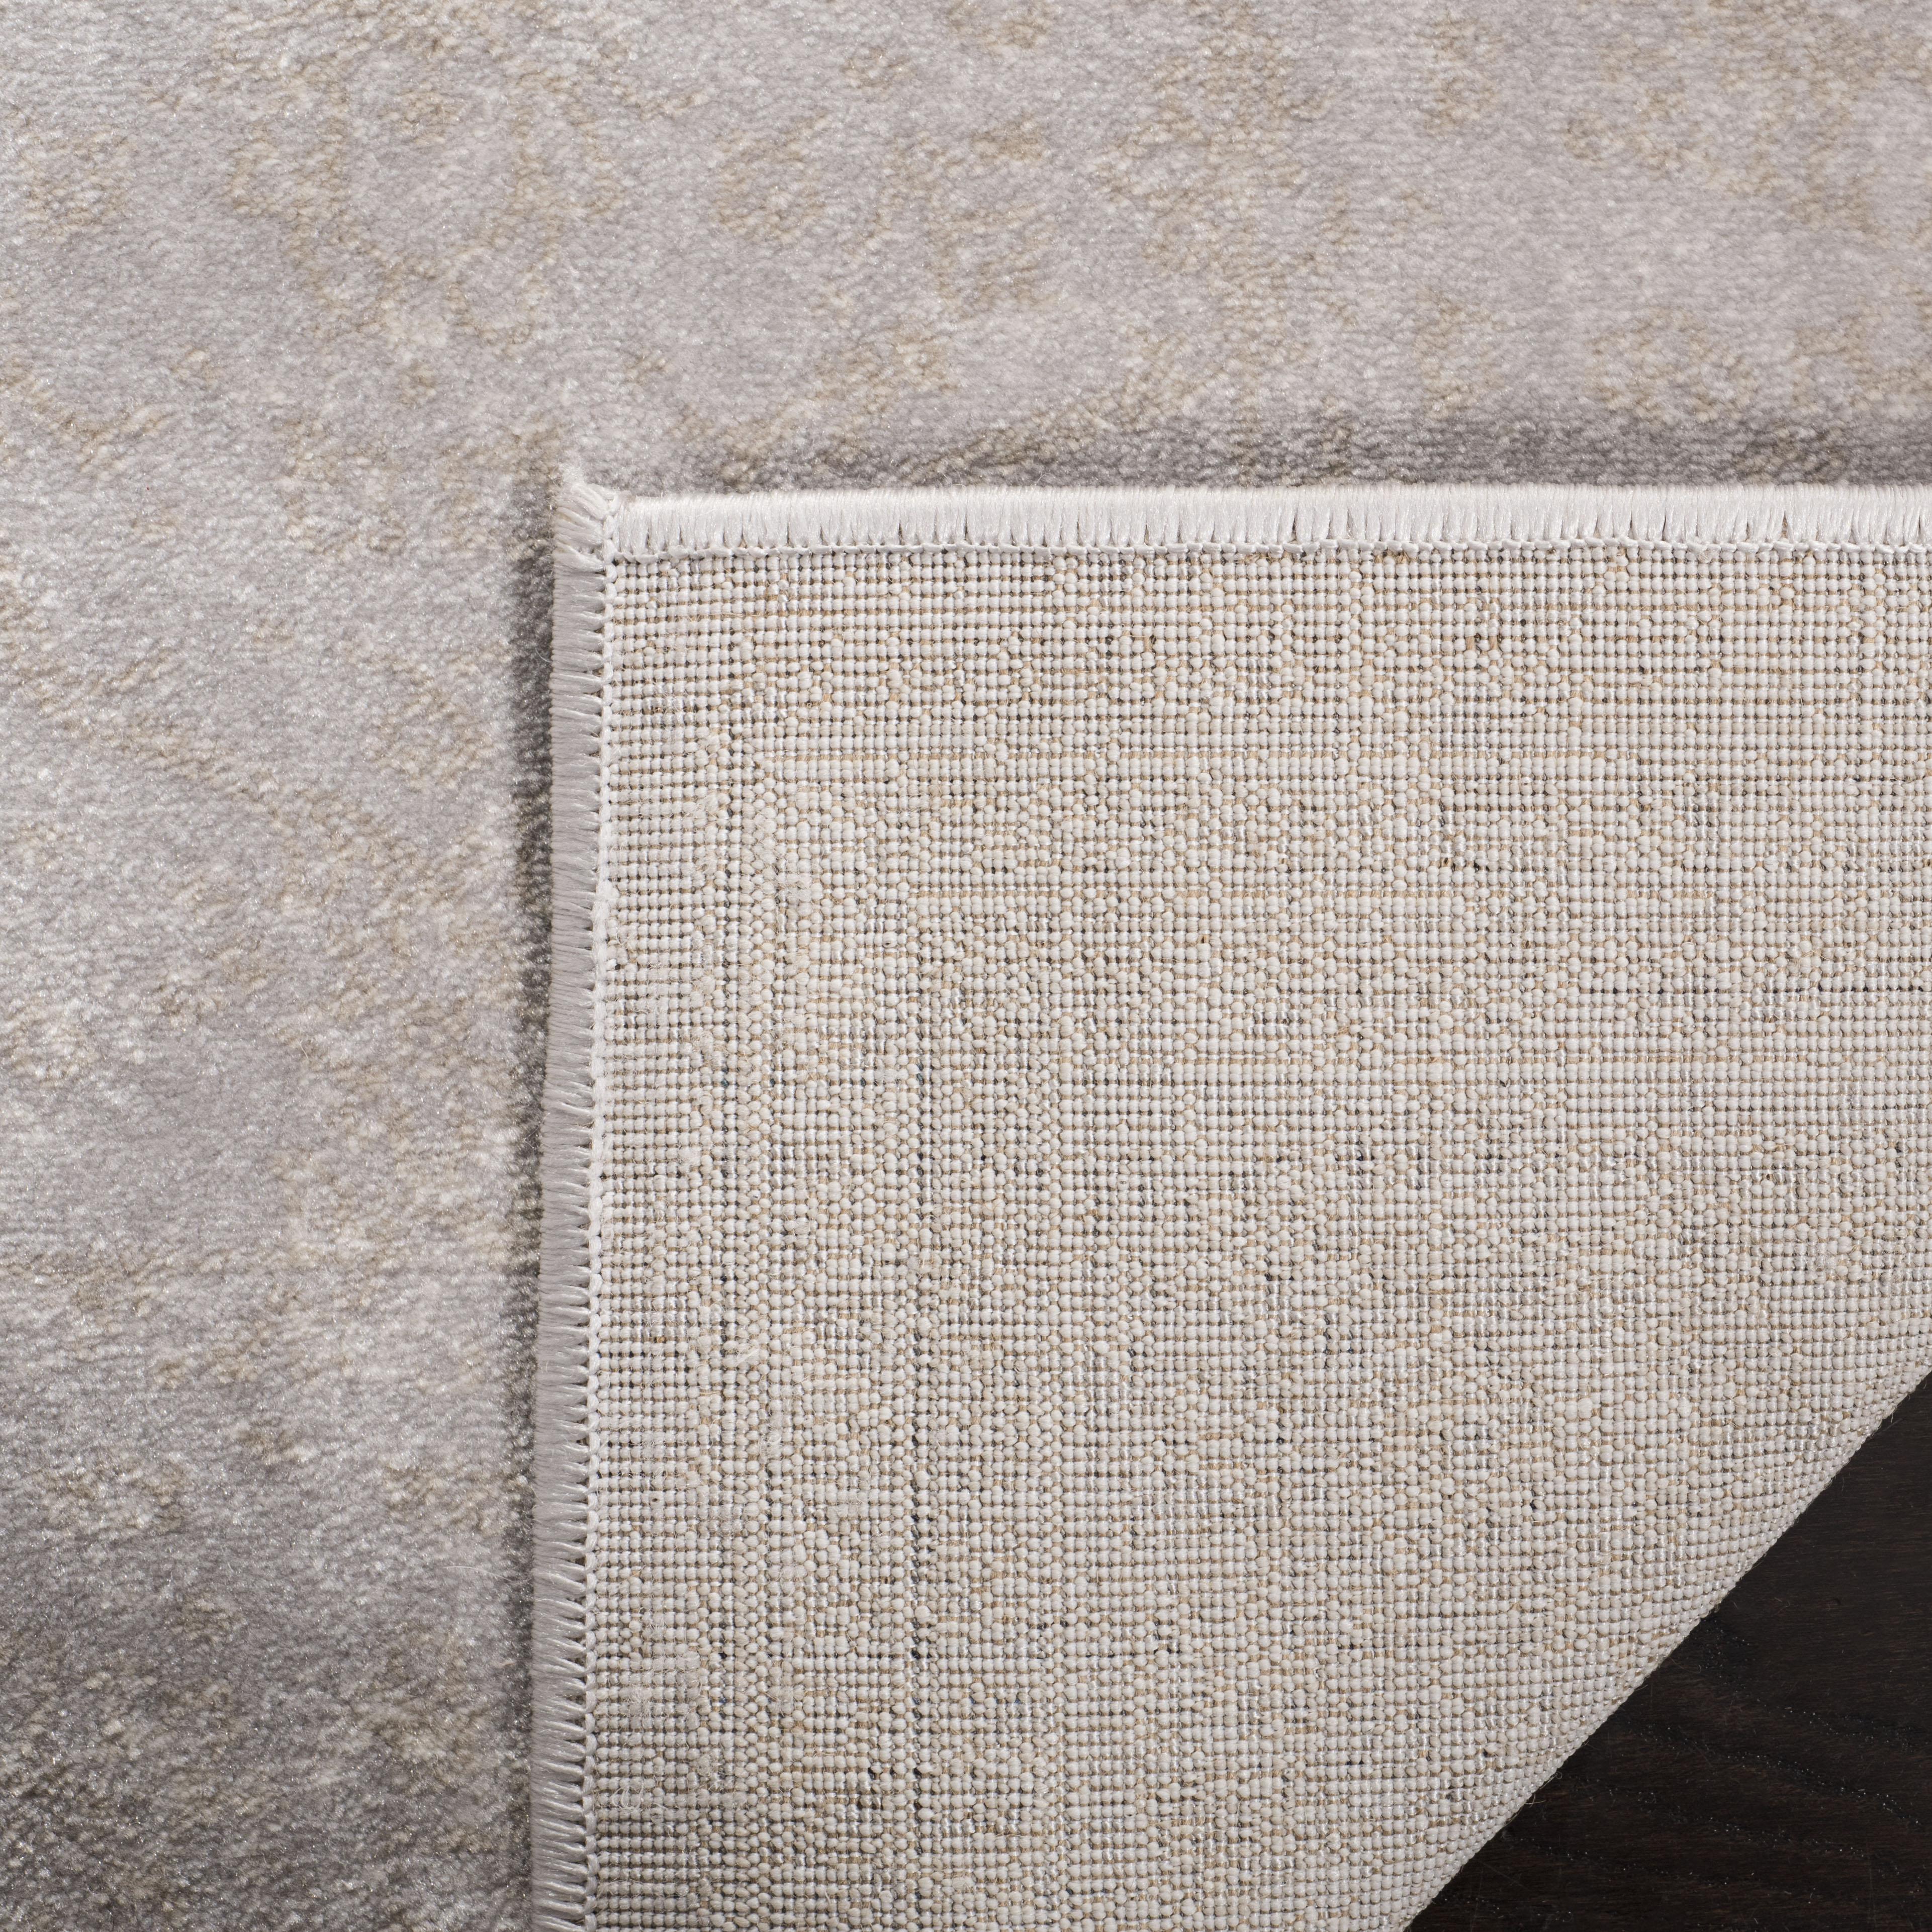 Devlin 691 9' X 12' Gray Polypropylene Rug